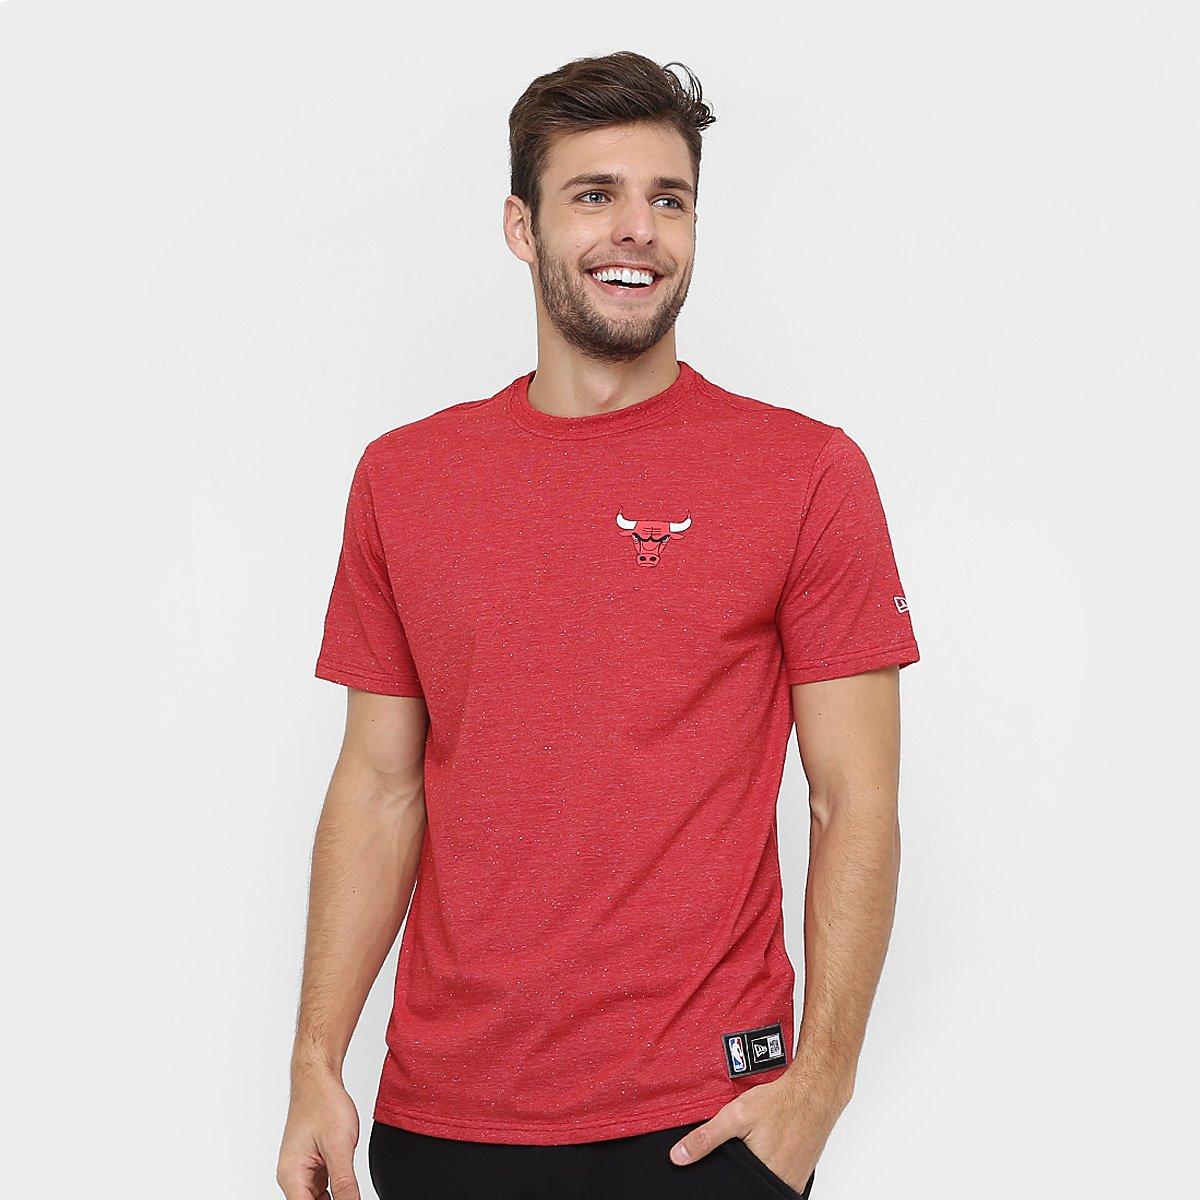 Camiseta New Era NBA Arabesco Chicago Bulls - Compre Agora  59d7db29b07